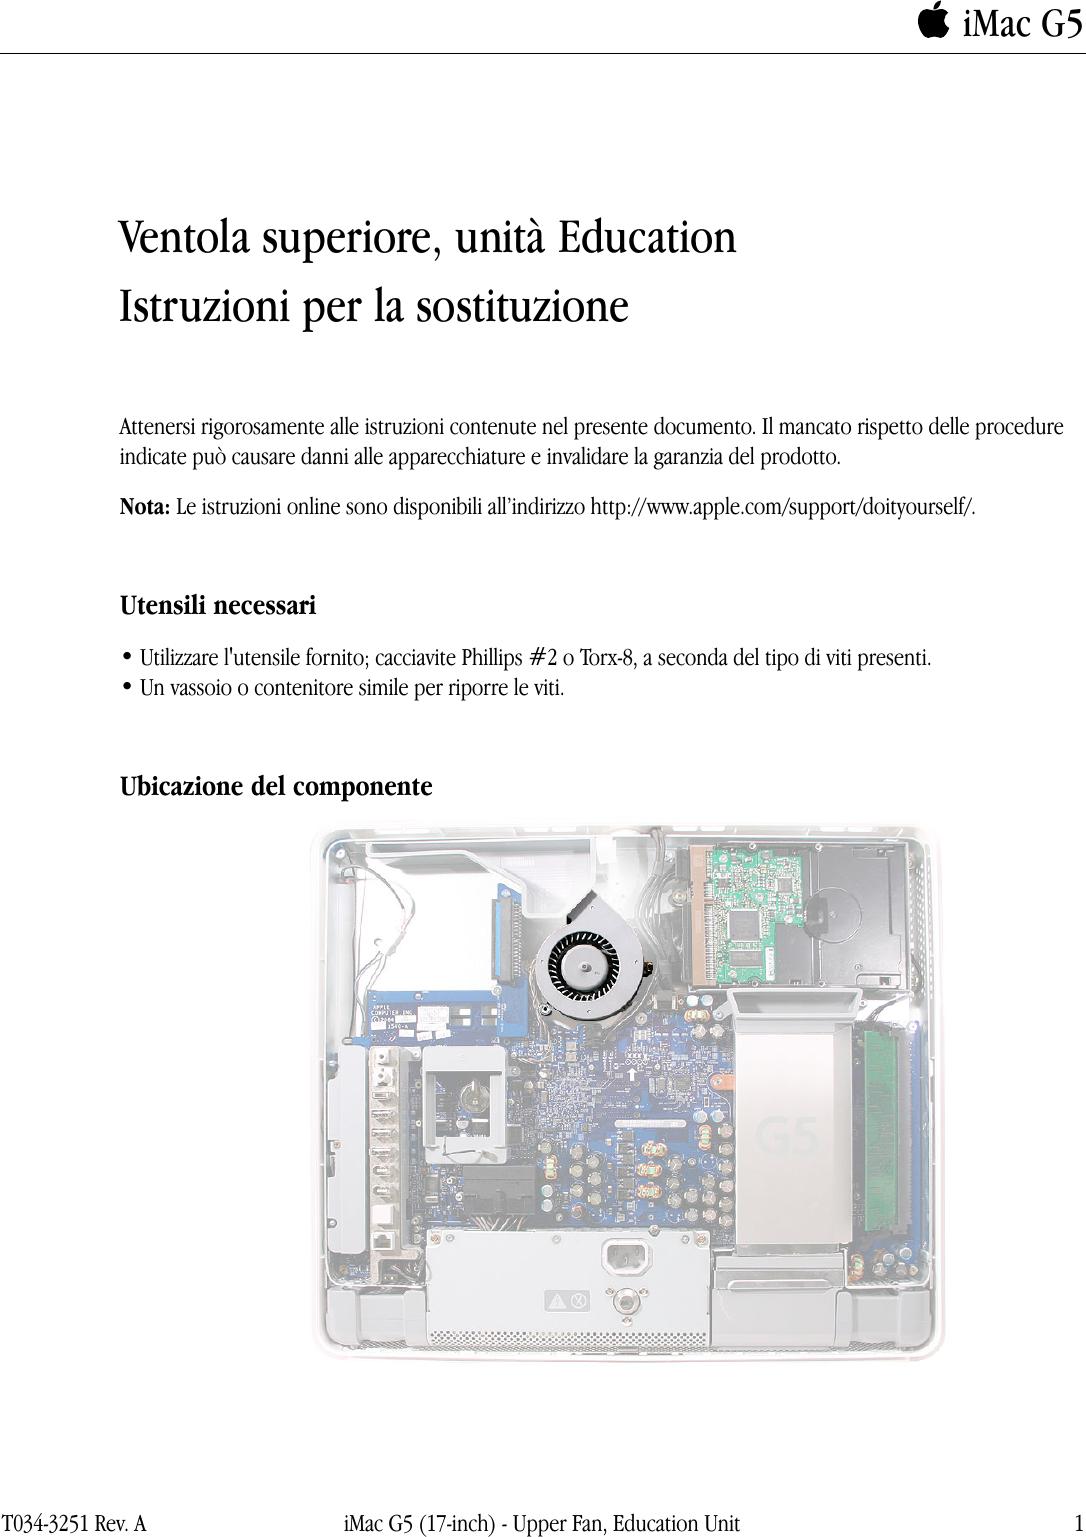 apple imac upper fan edu user manual i mac g5 17 inch no optical rh usermanual wiki iMac G3 imac g5 user manual